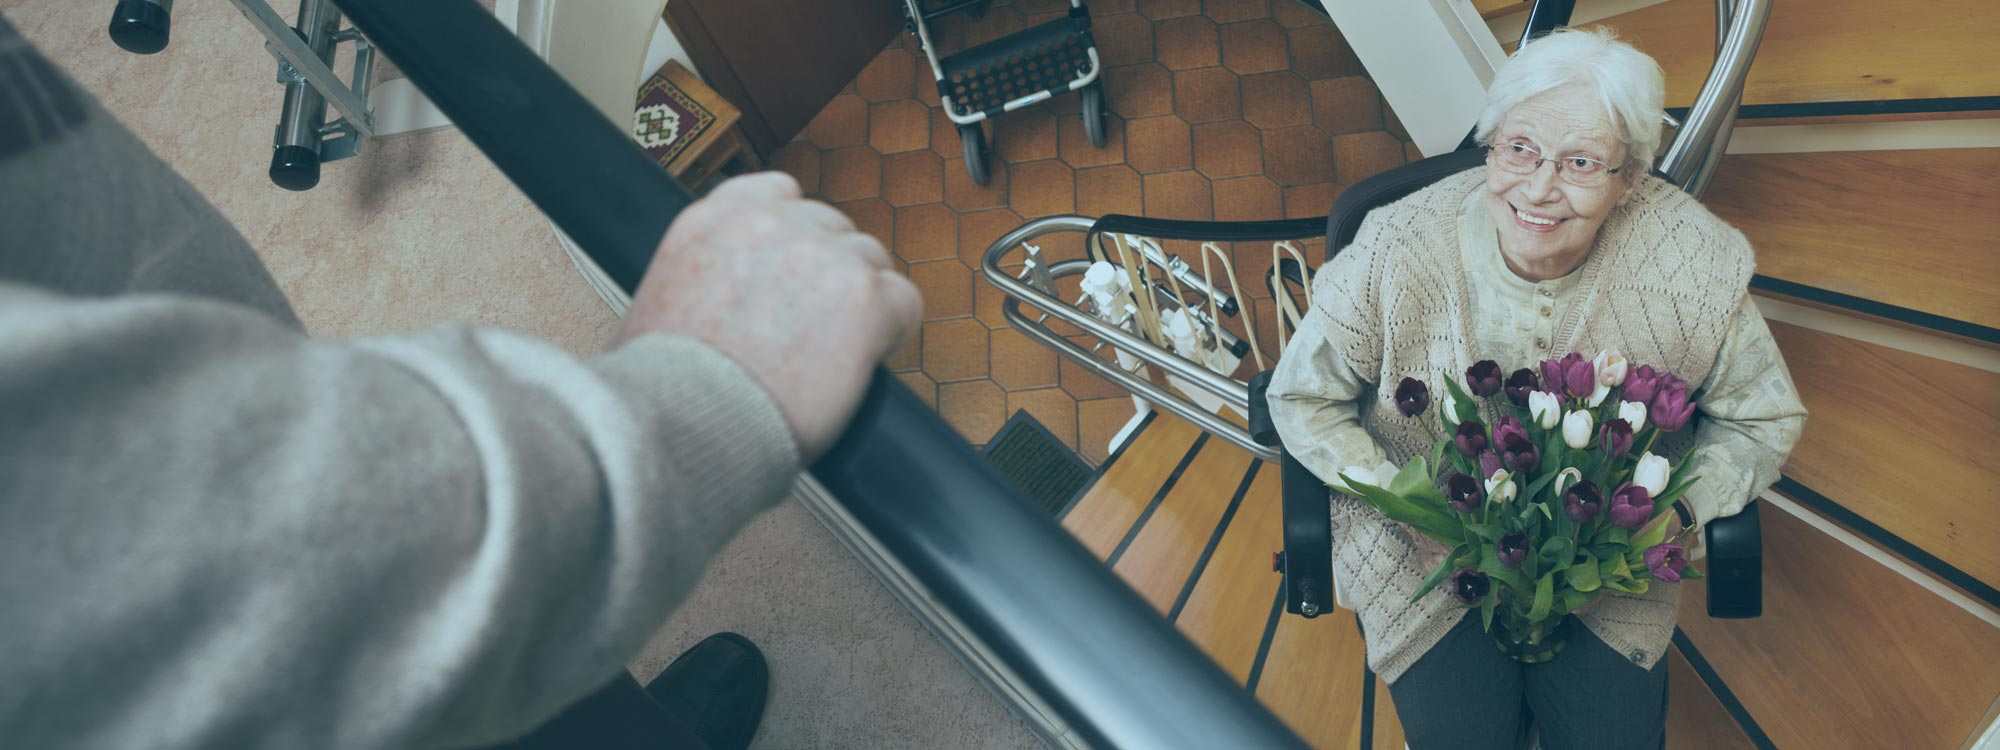 Treppenlifte für kurvige Treppen